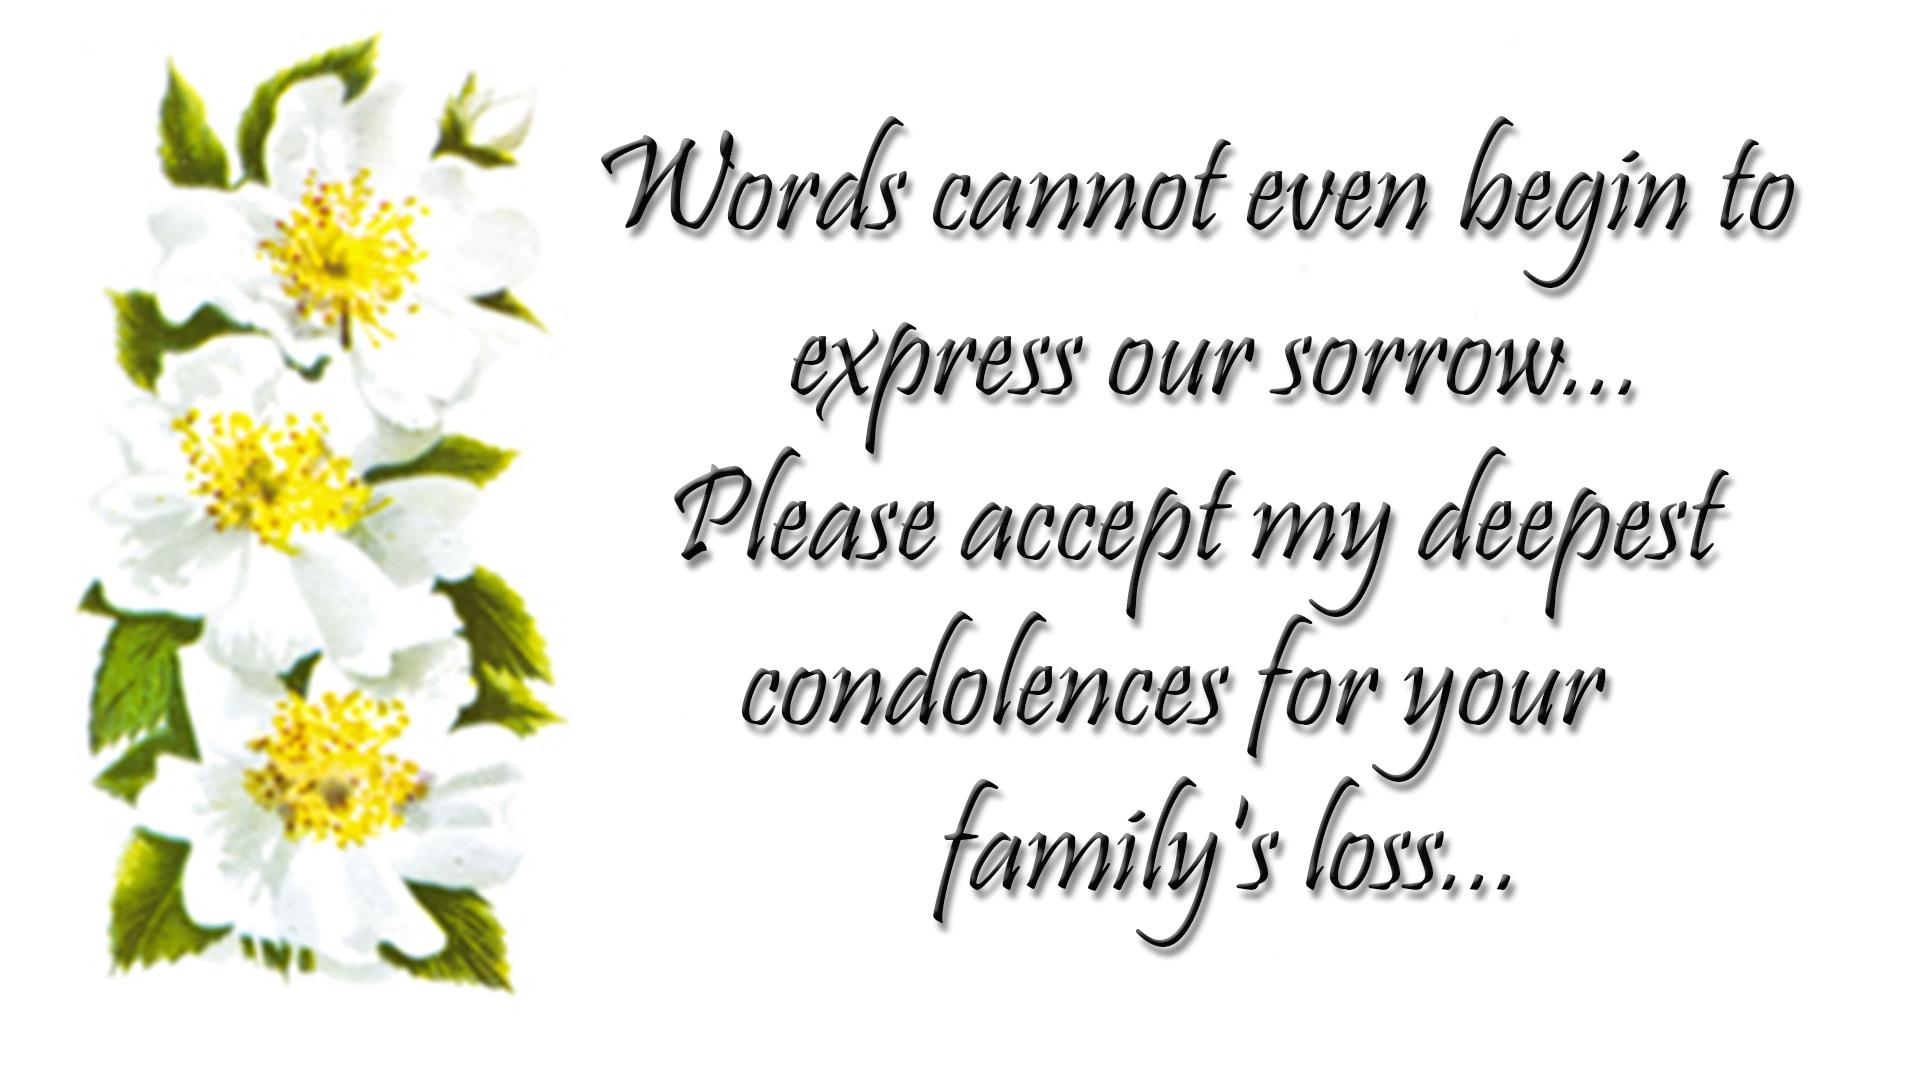 Condolences Quotes & Sympathy Messages Images Free Download